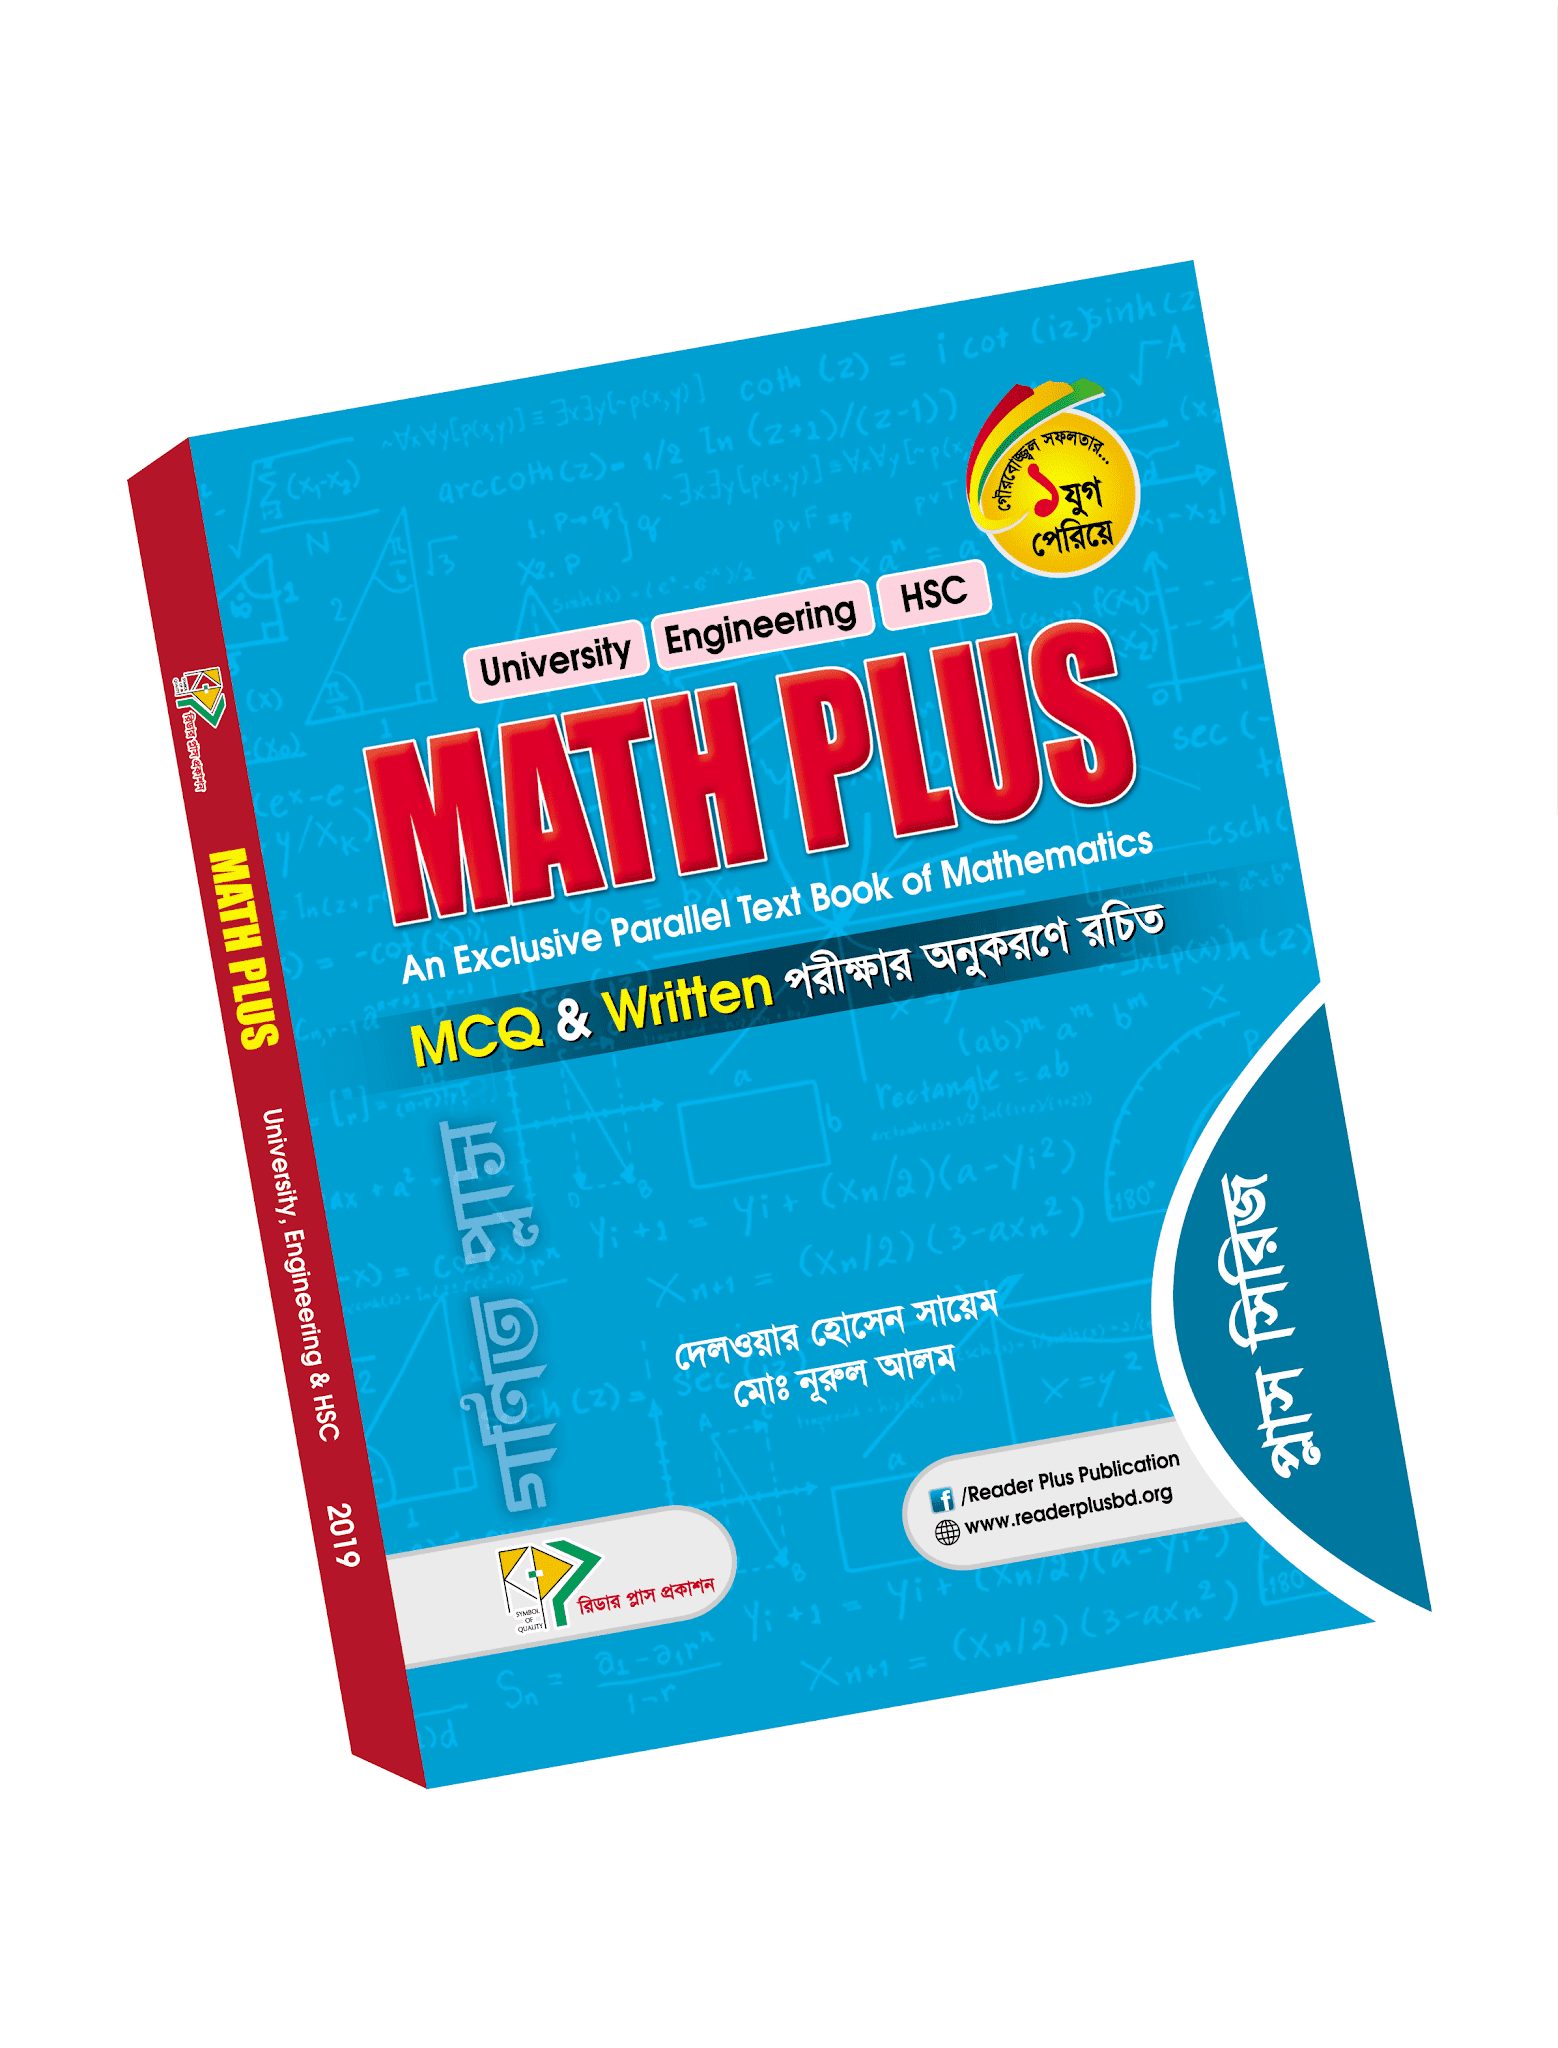 math plus admission book pdf download link, math plus admission book pdf, math plus admission book, math plus admission book pdf download